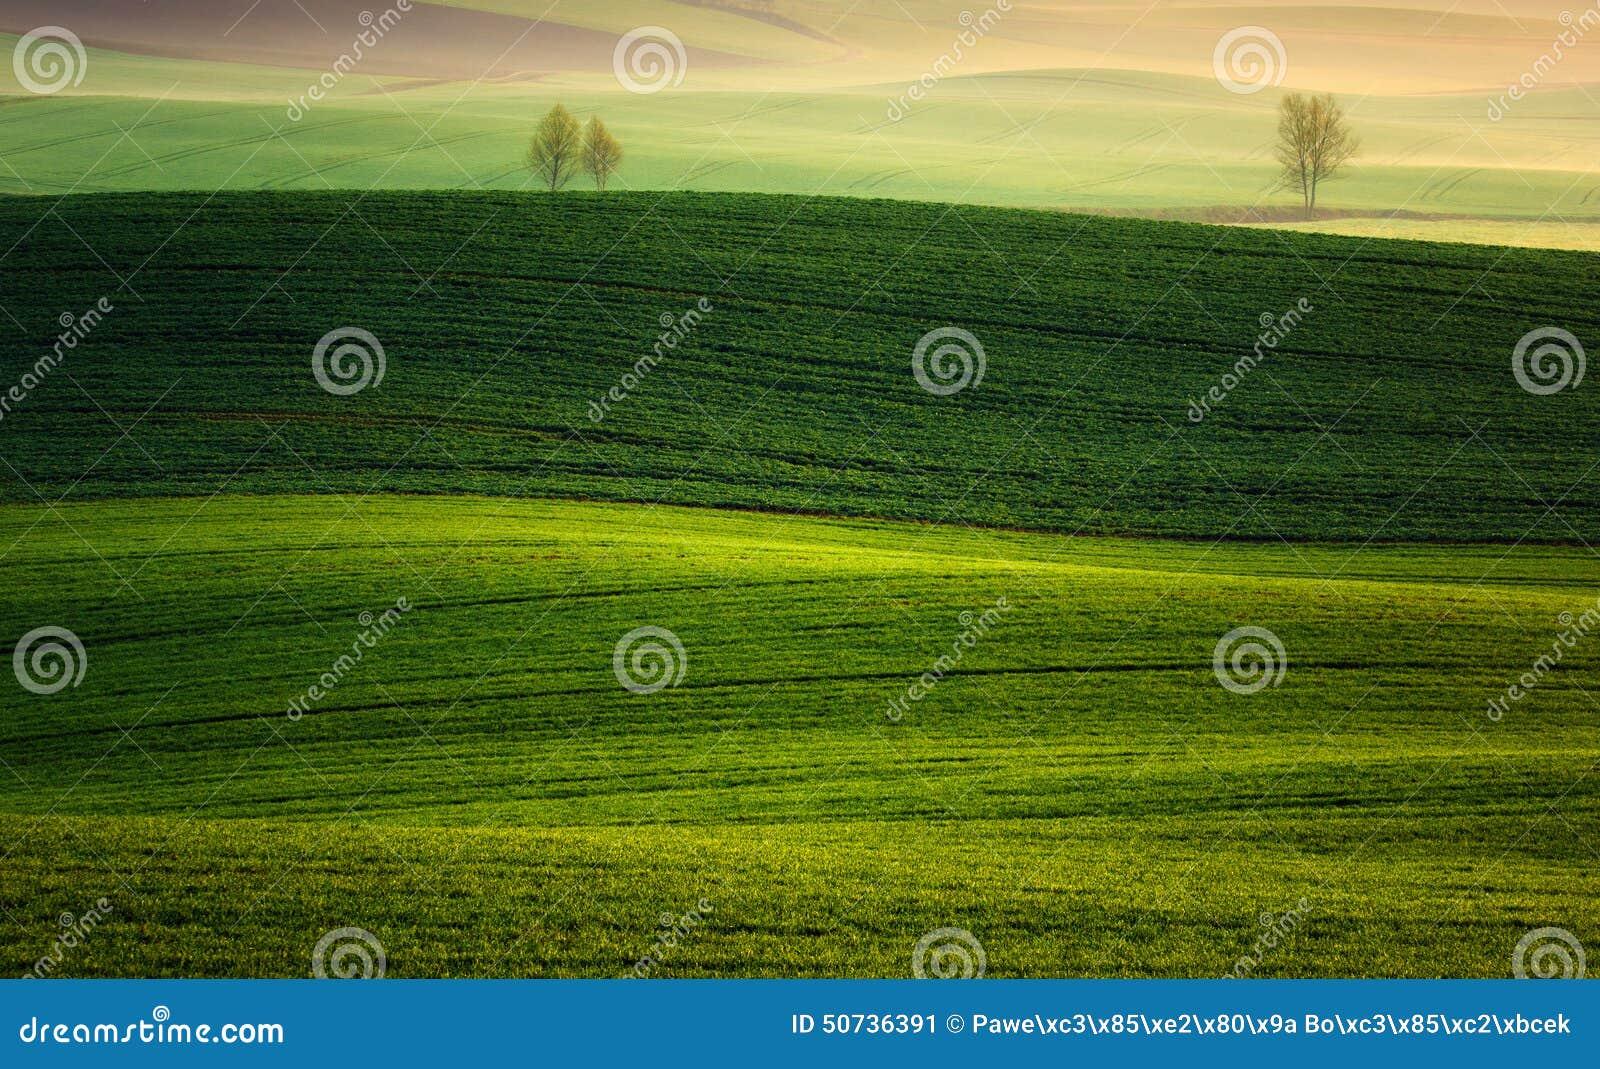 Farm in the spring of rising sun.